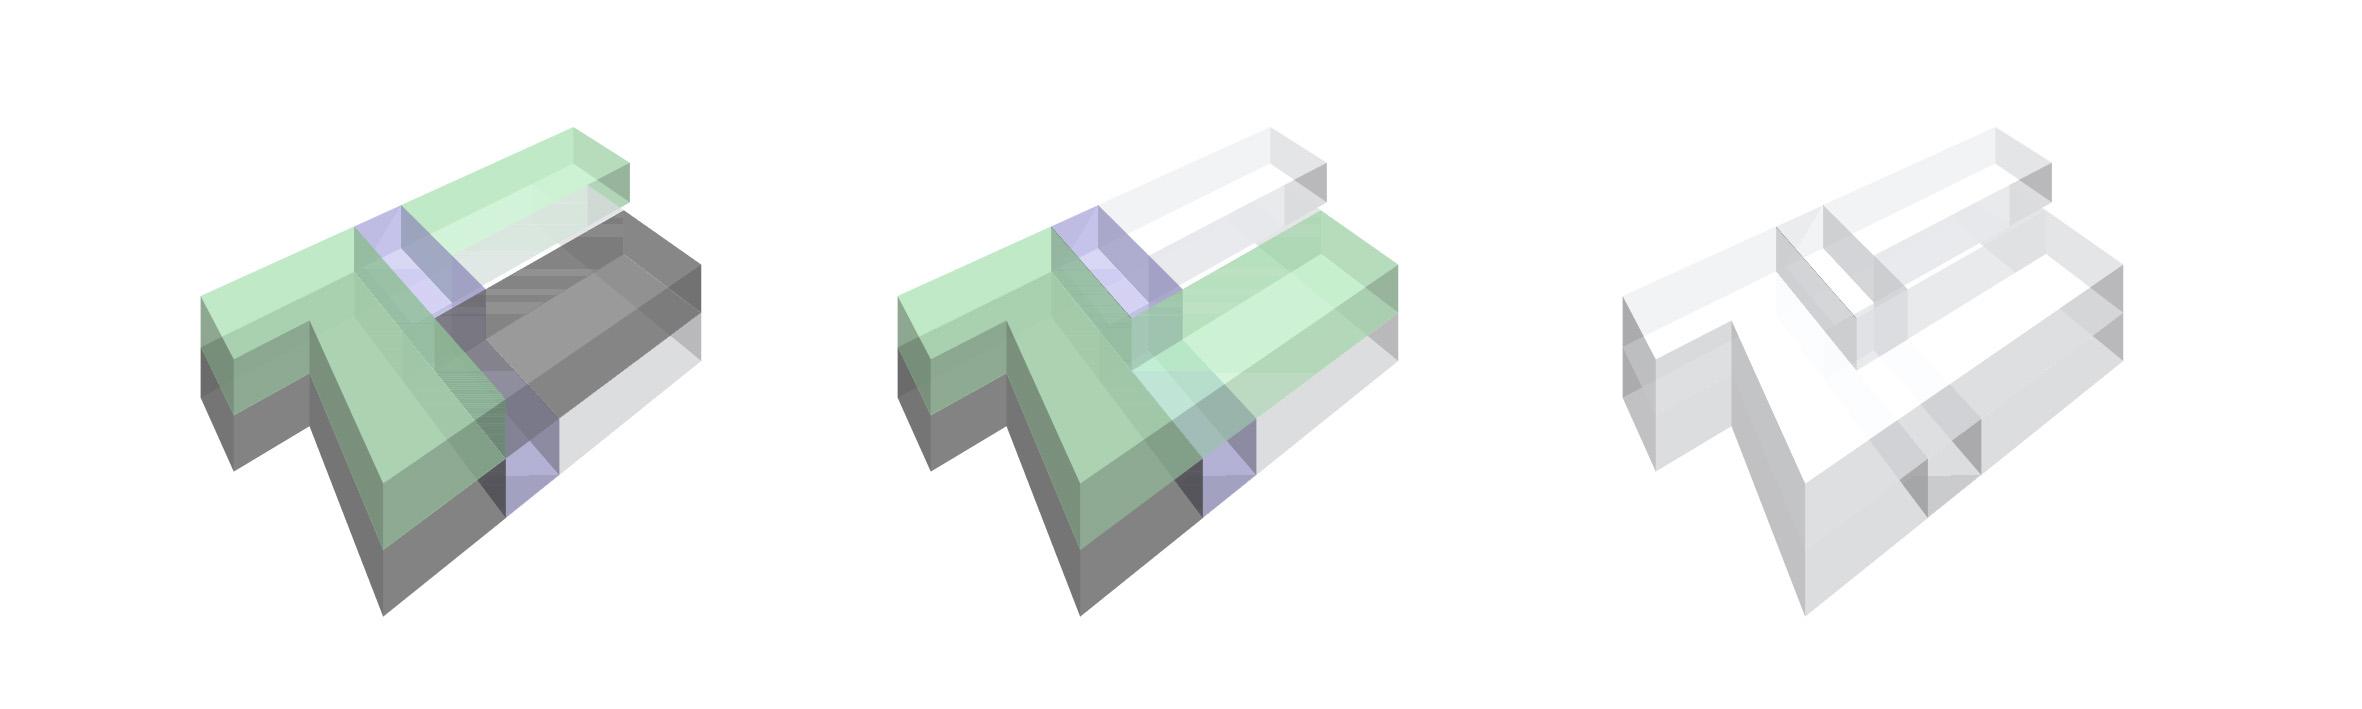 KO_構成2.jpg